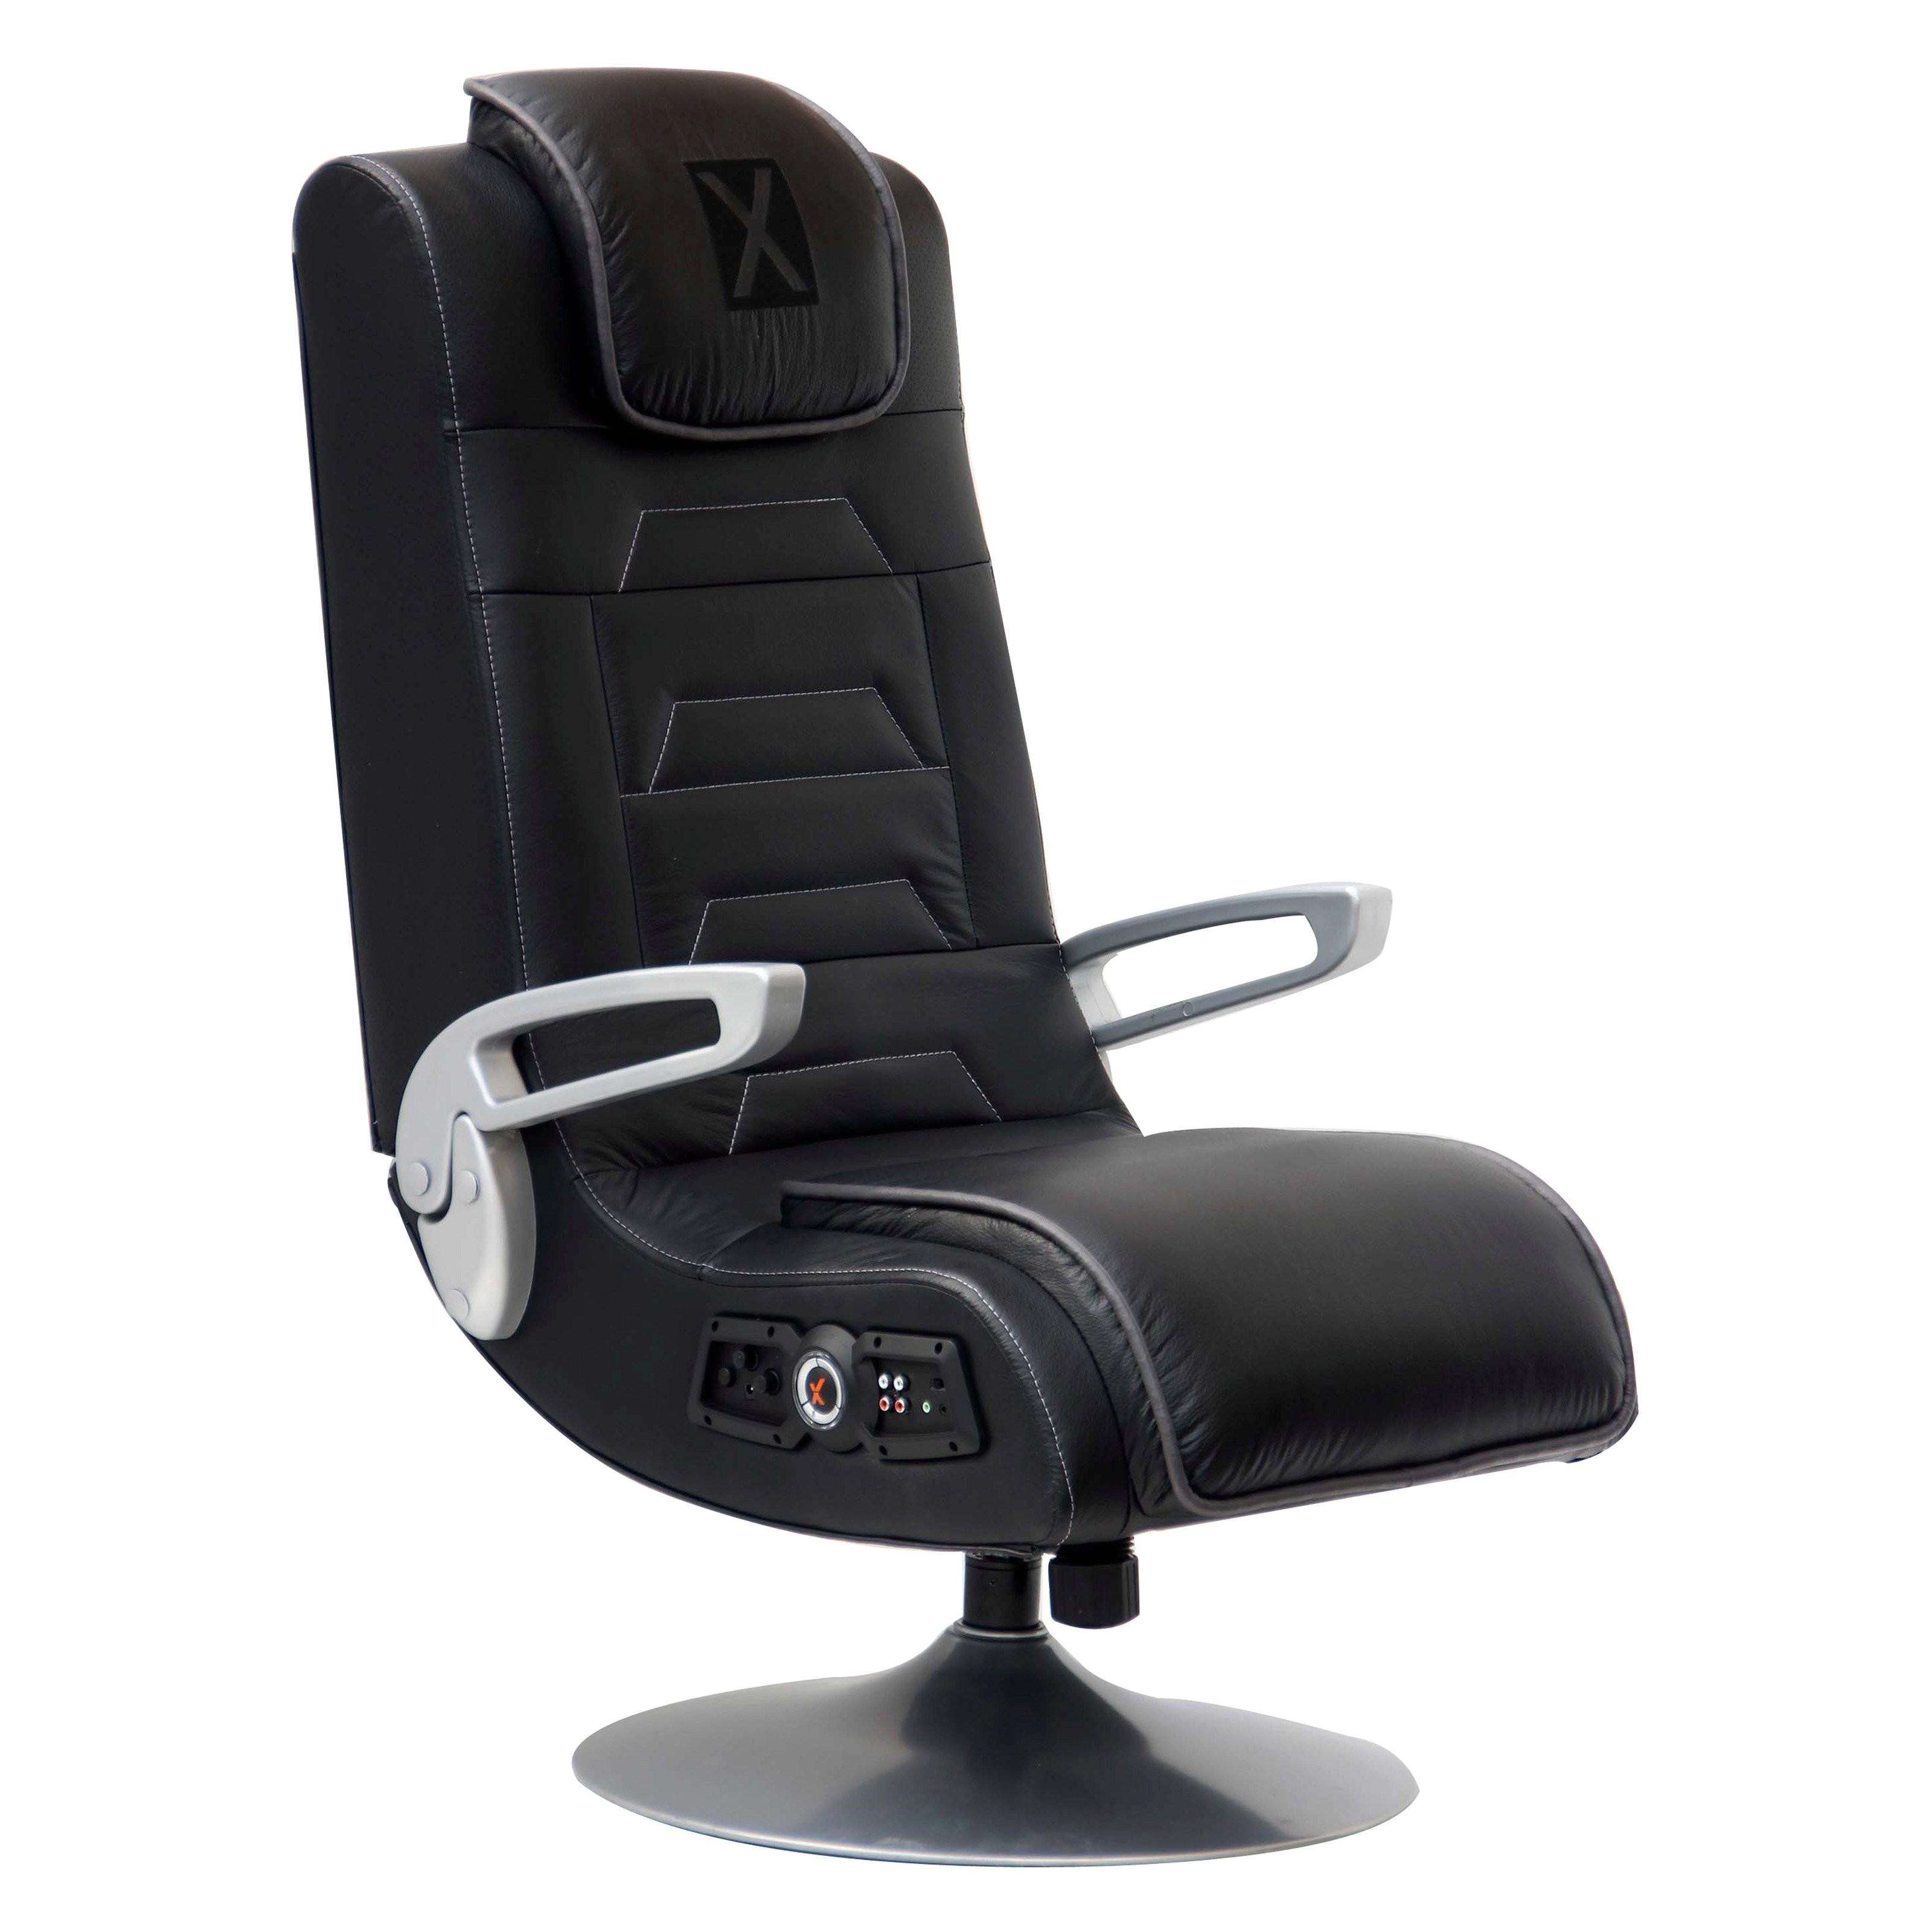 X Rocker Pro Gaming Chair X Rocker 4 1 Pro Series Pedestal Wireless Game Chair 5129601 Hayneedle